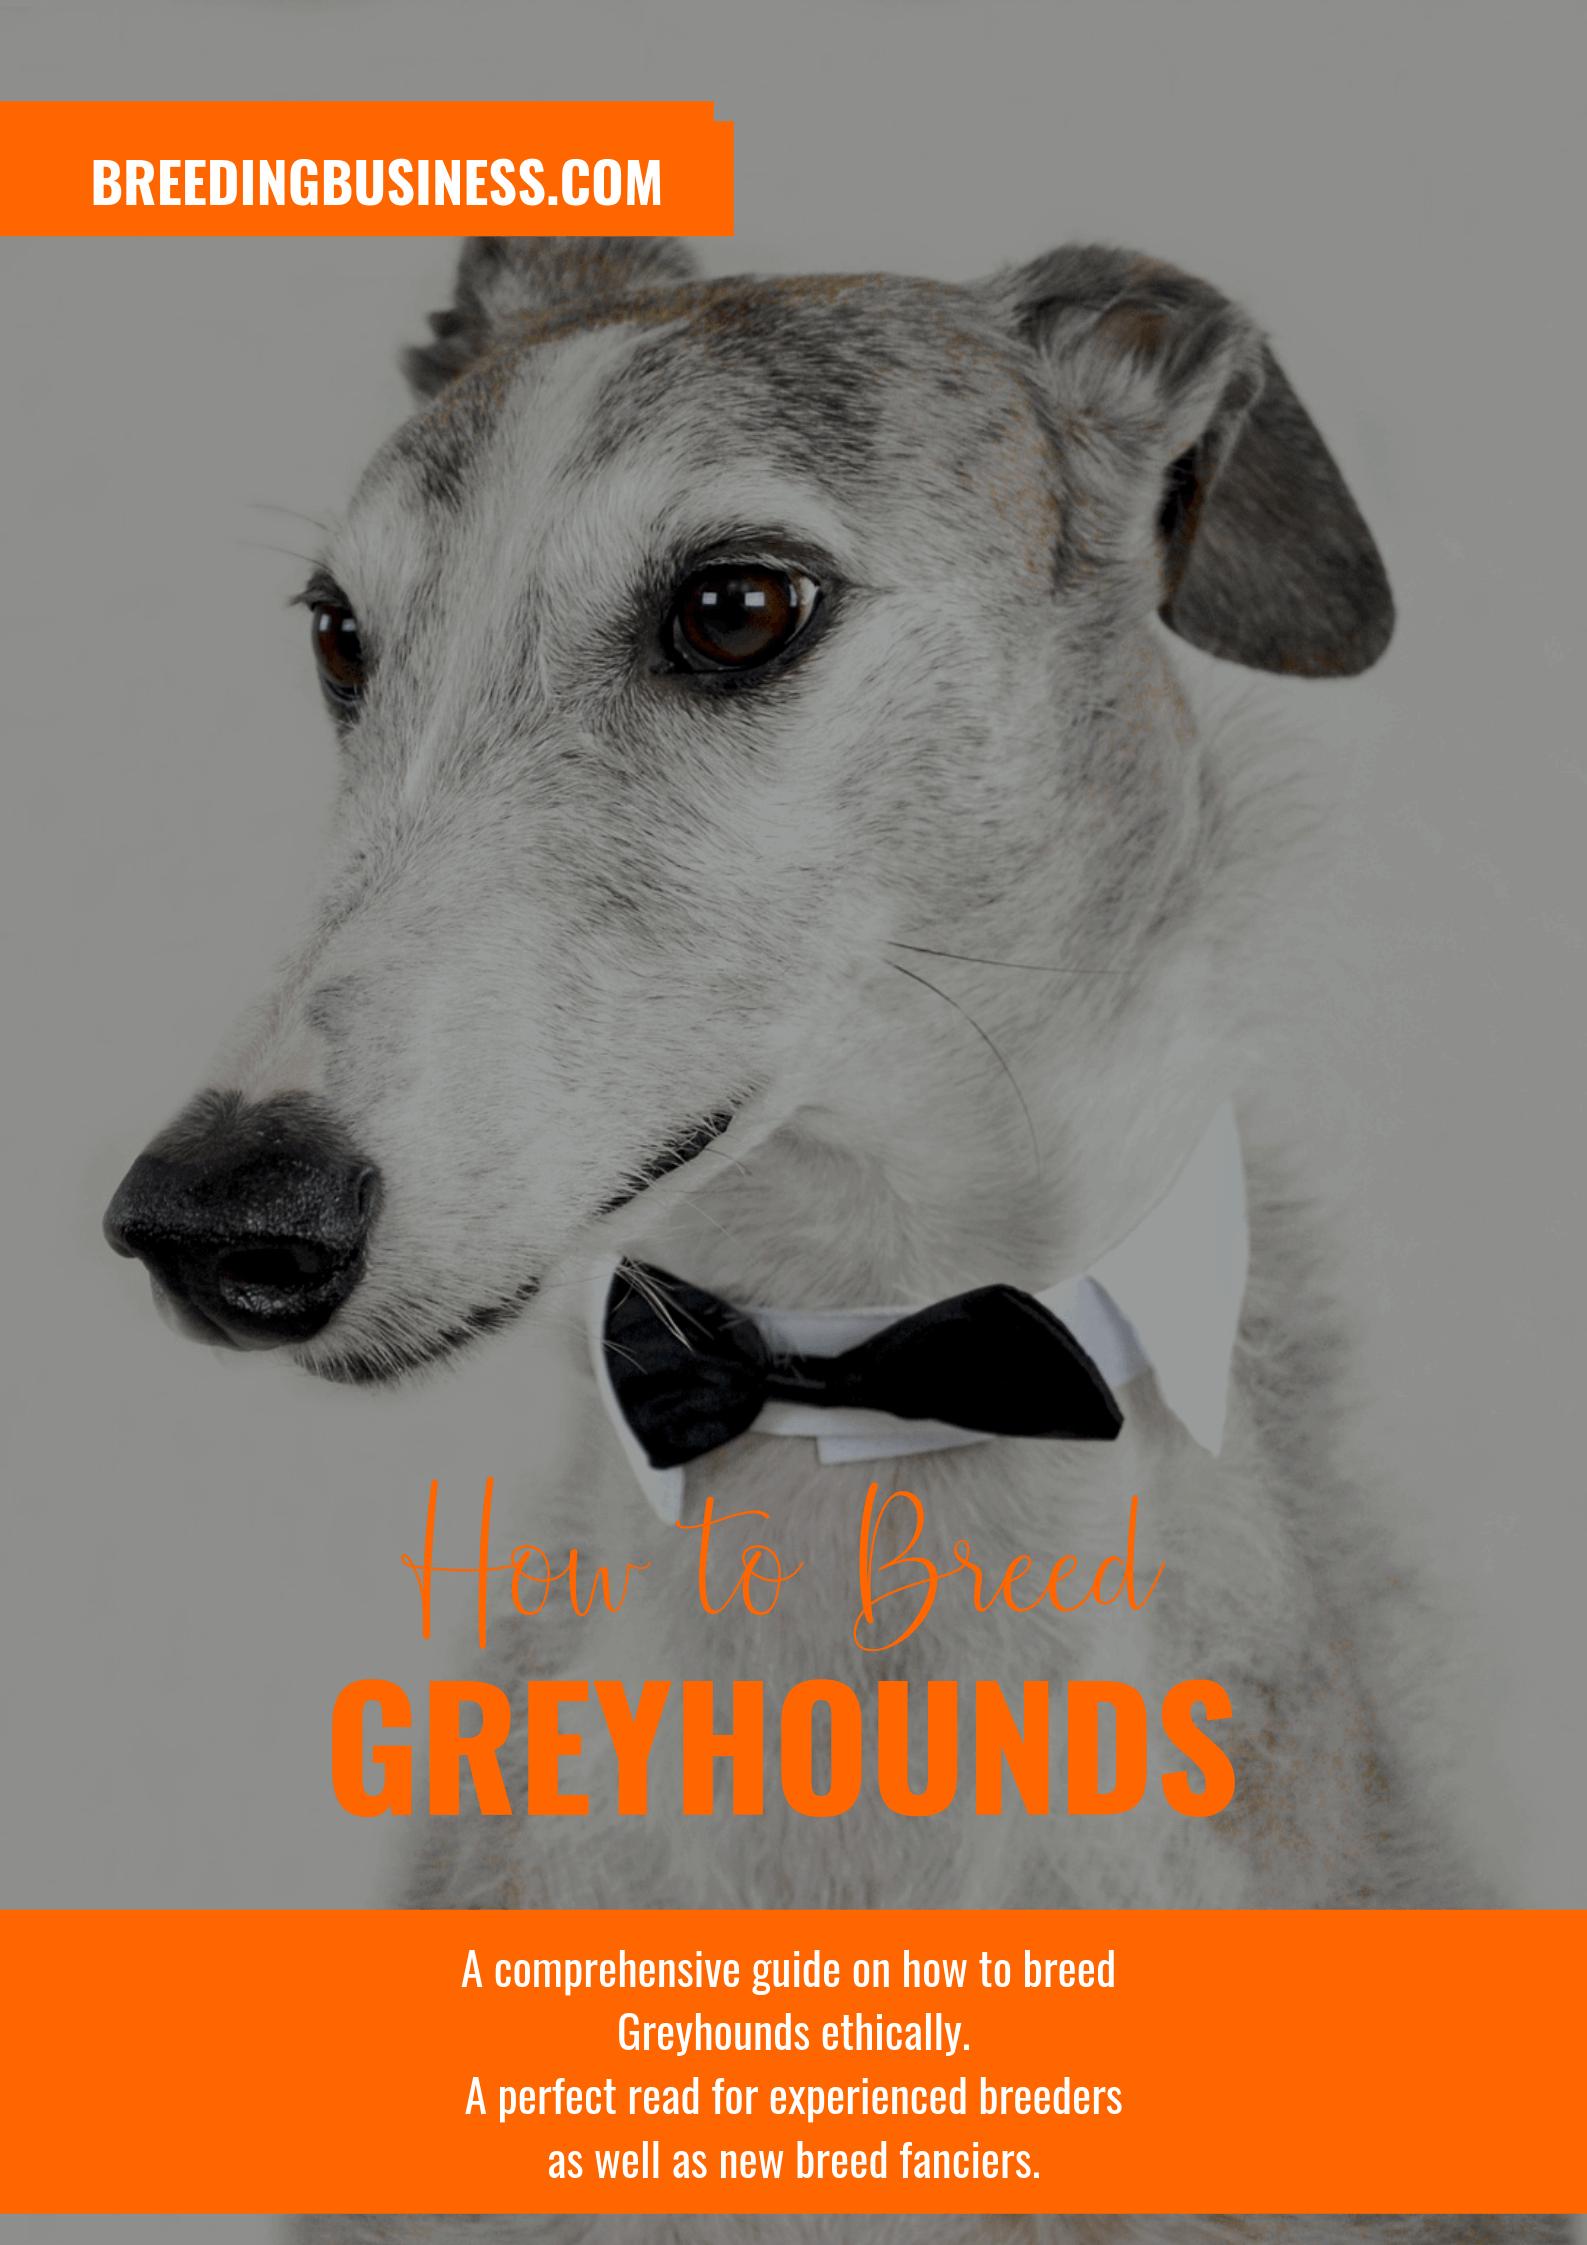 breeding Greyhounds